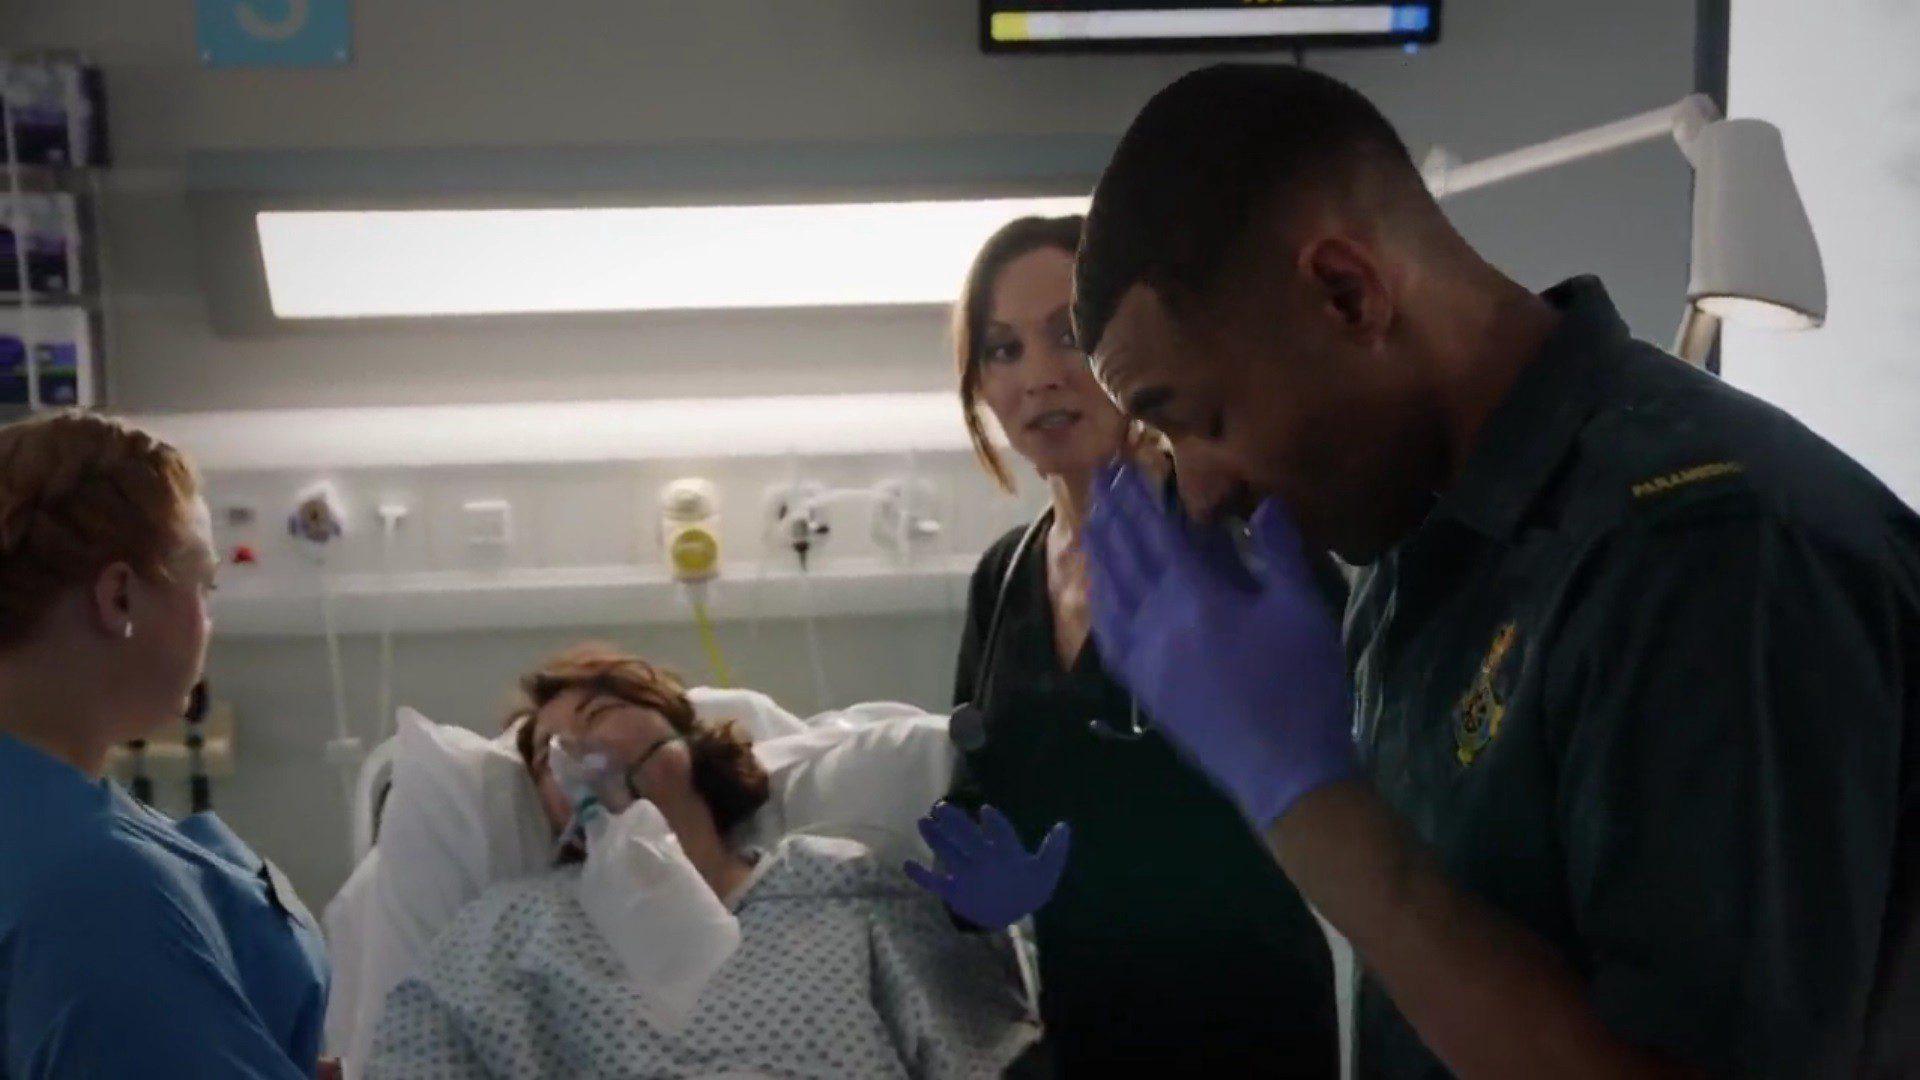 Casualty Season 36 Episode 1 Spoilers